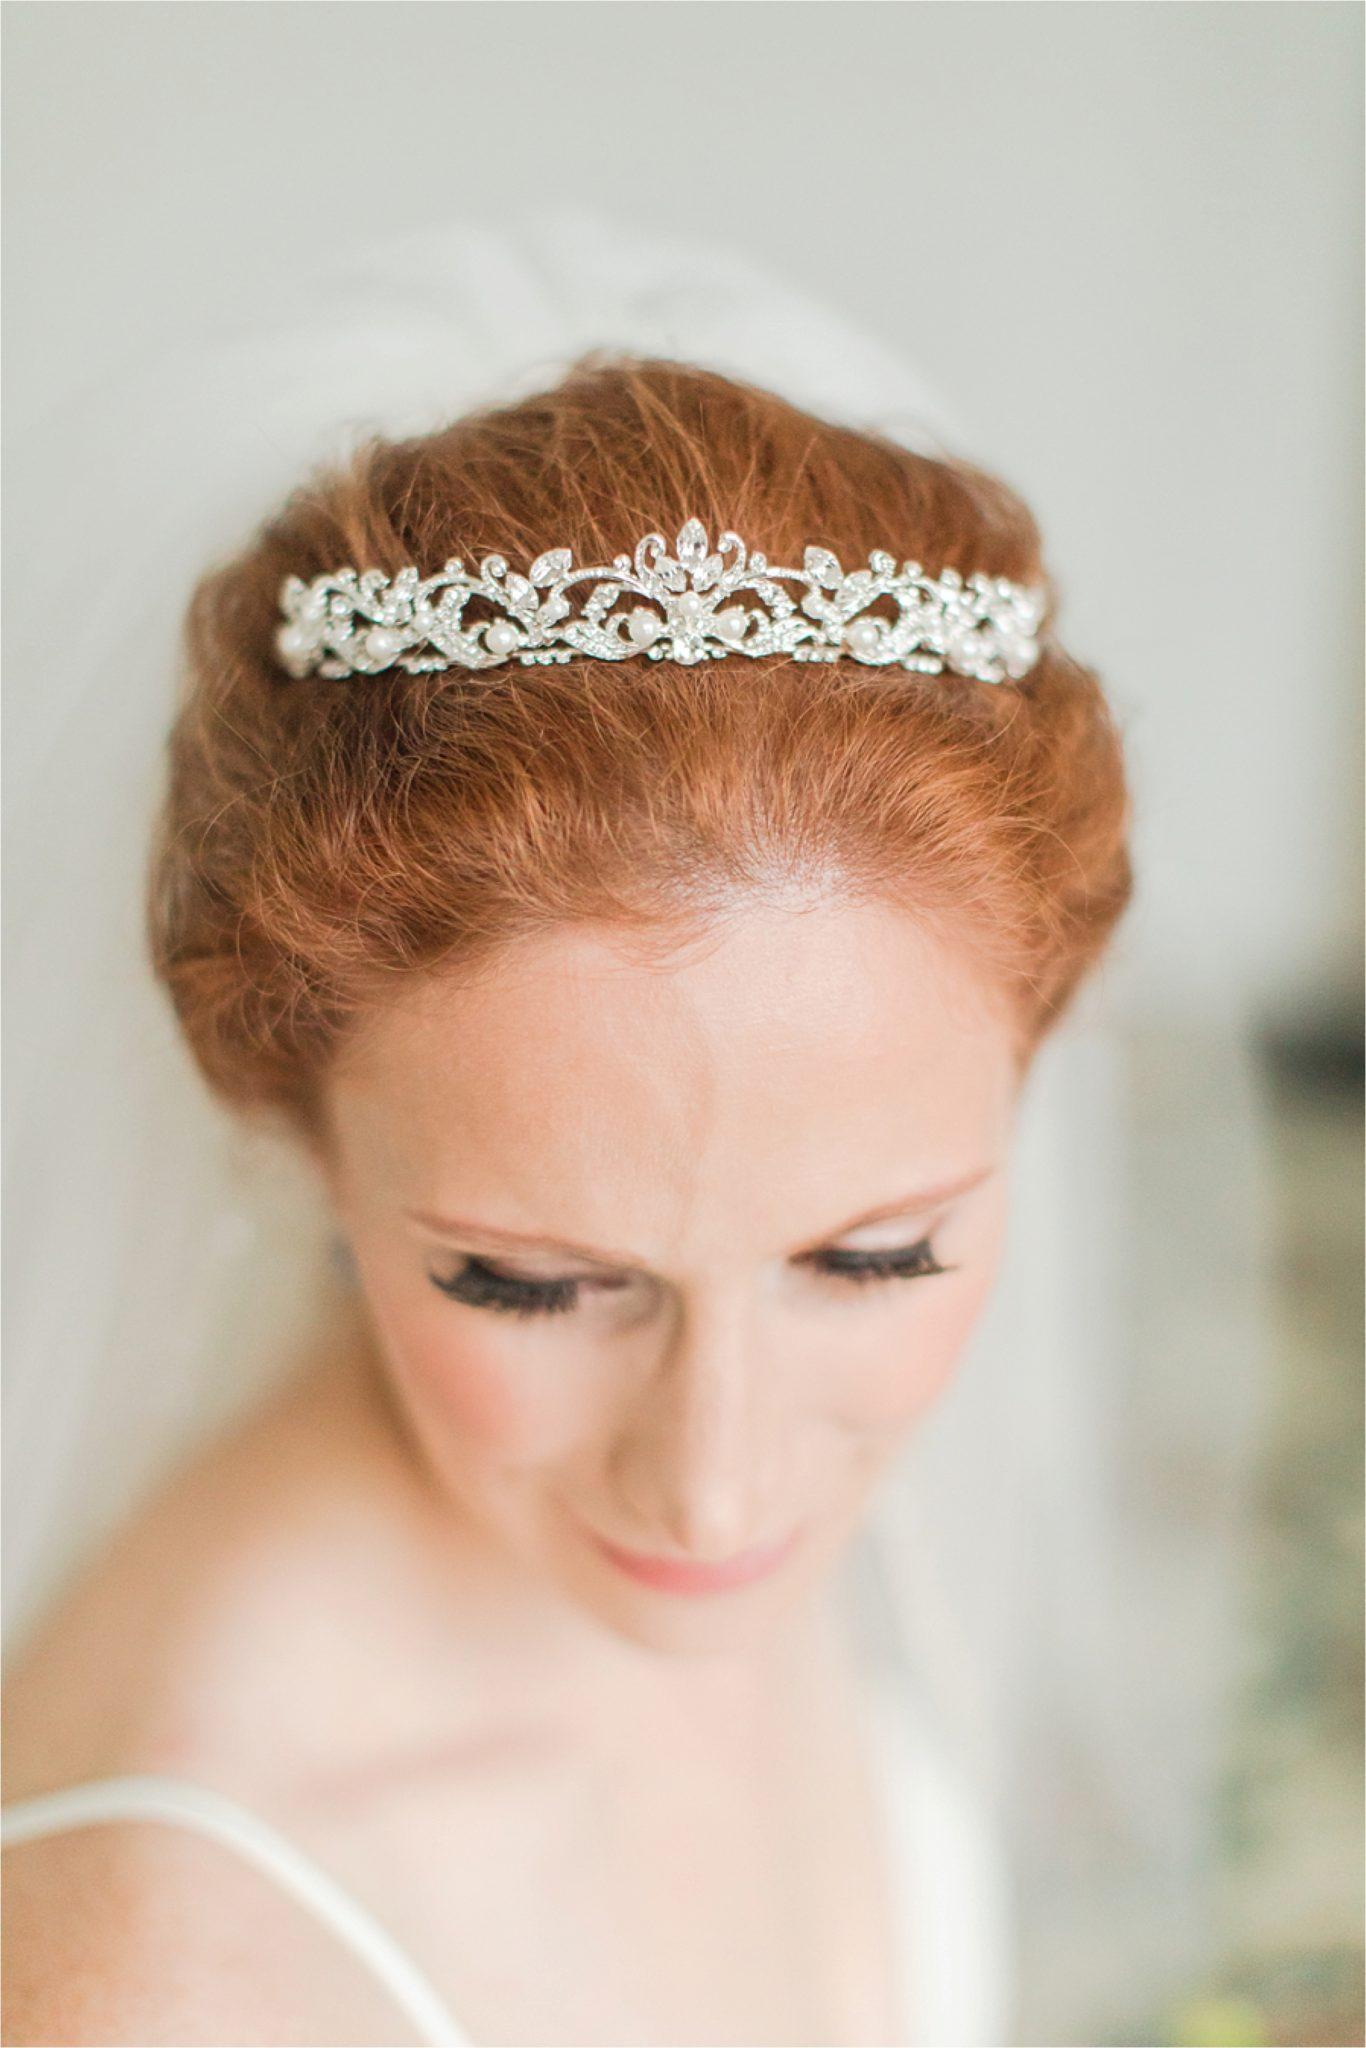 Bridal Session at The Pillars of Mobile-Mobile Alabama Wedding Photographer-Sarra-Bridal session